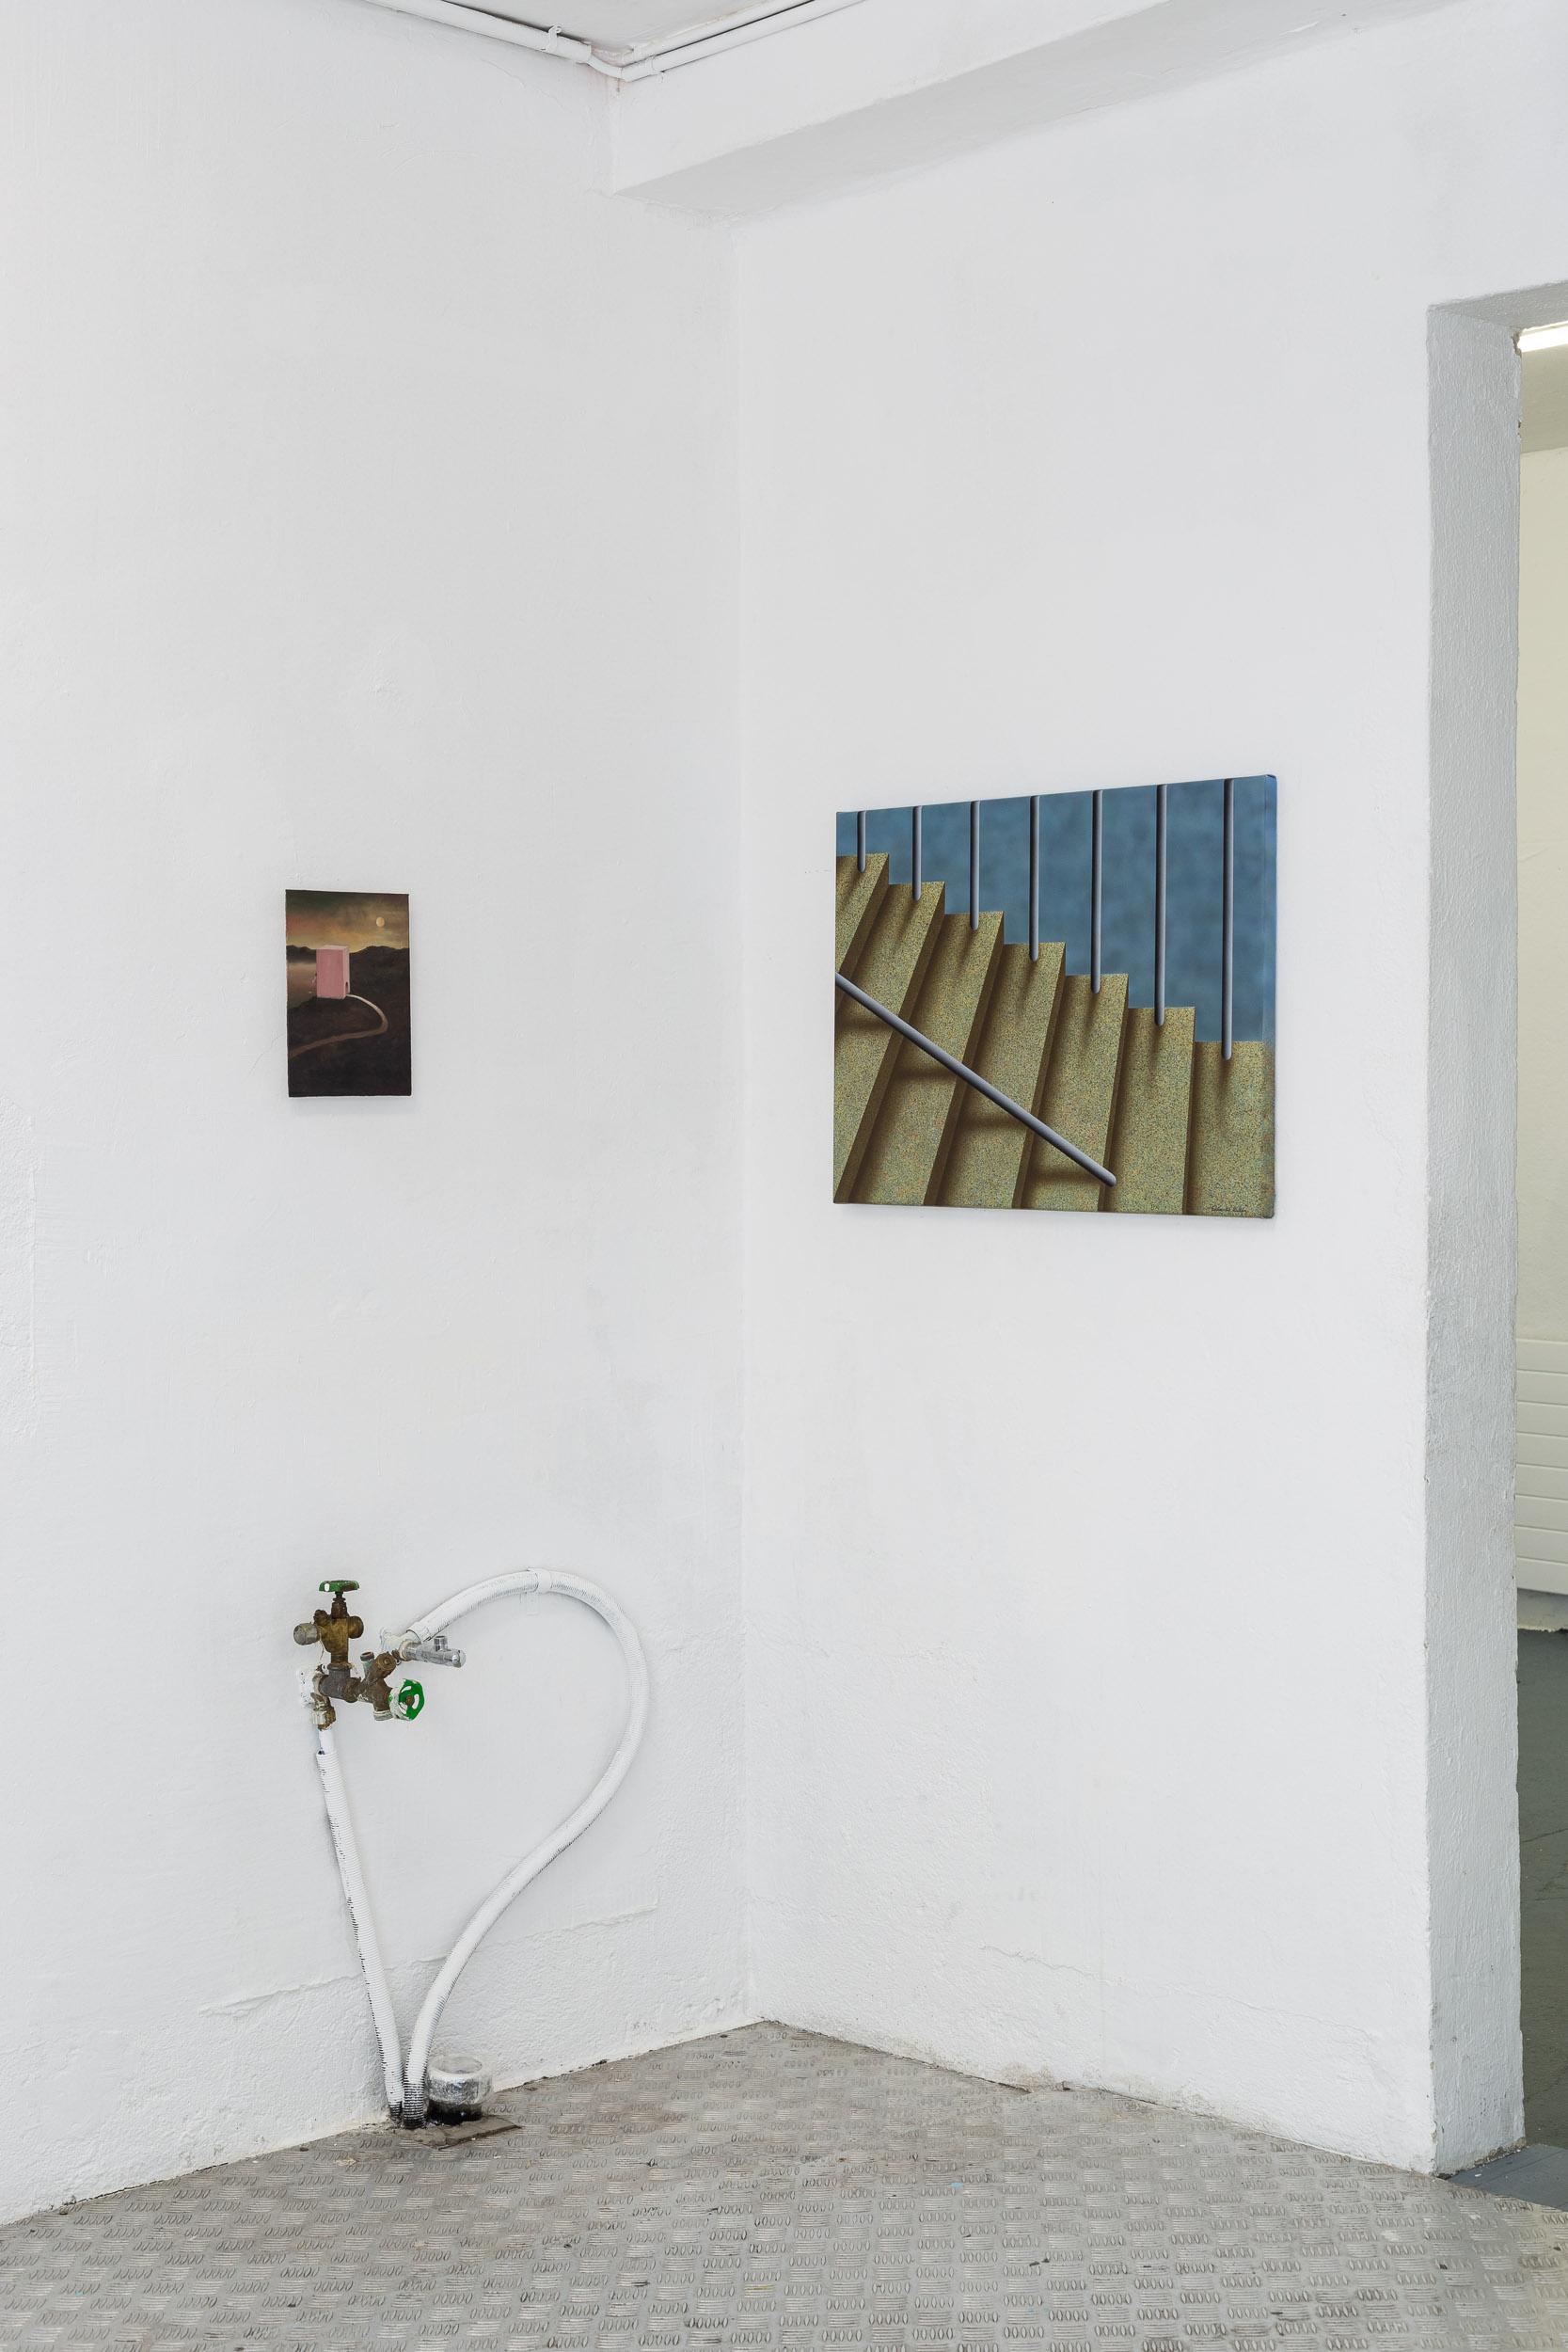 Left: Francisco Sierra,  NewExBolígrafo  (series), 2015-ongoing, oil on board, 24 x 18cm  Right: Eduardo Rubén,  Untitled , 2014, acrylic on canvas, 50 x 70 cm  Photo: Kilian Bannwart